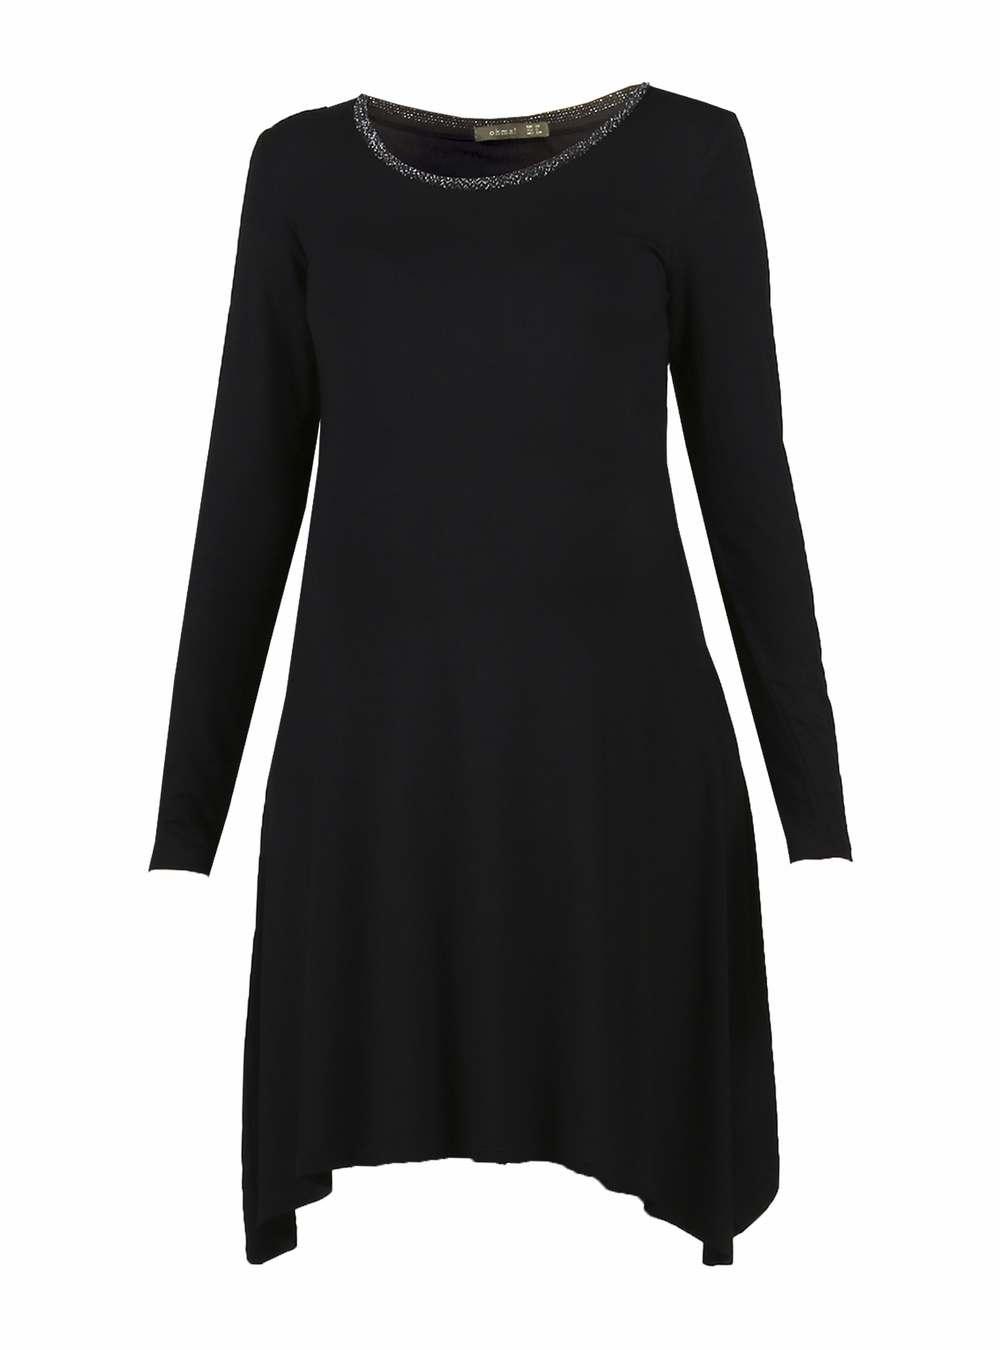 Vestido Negro Cuello Plateado